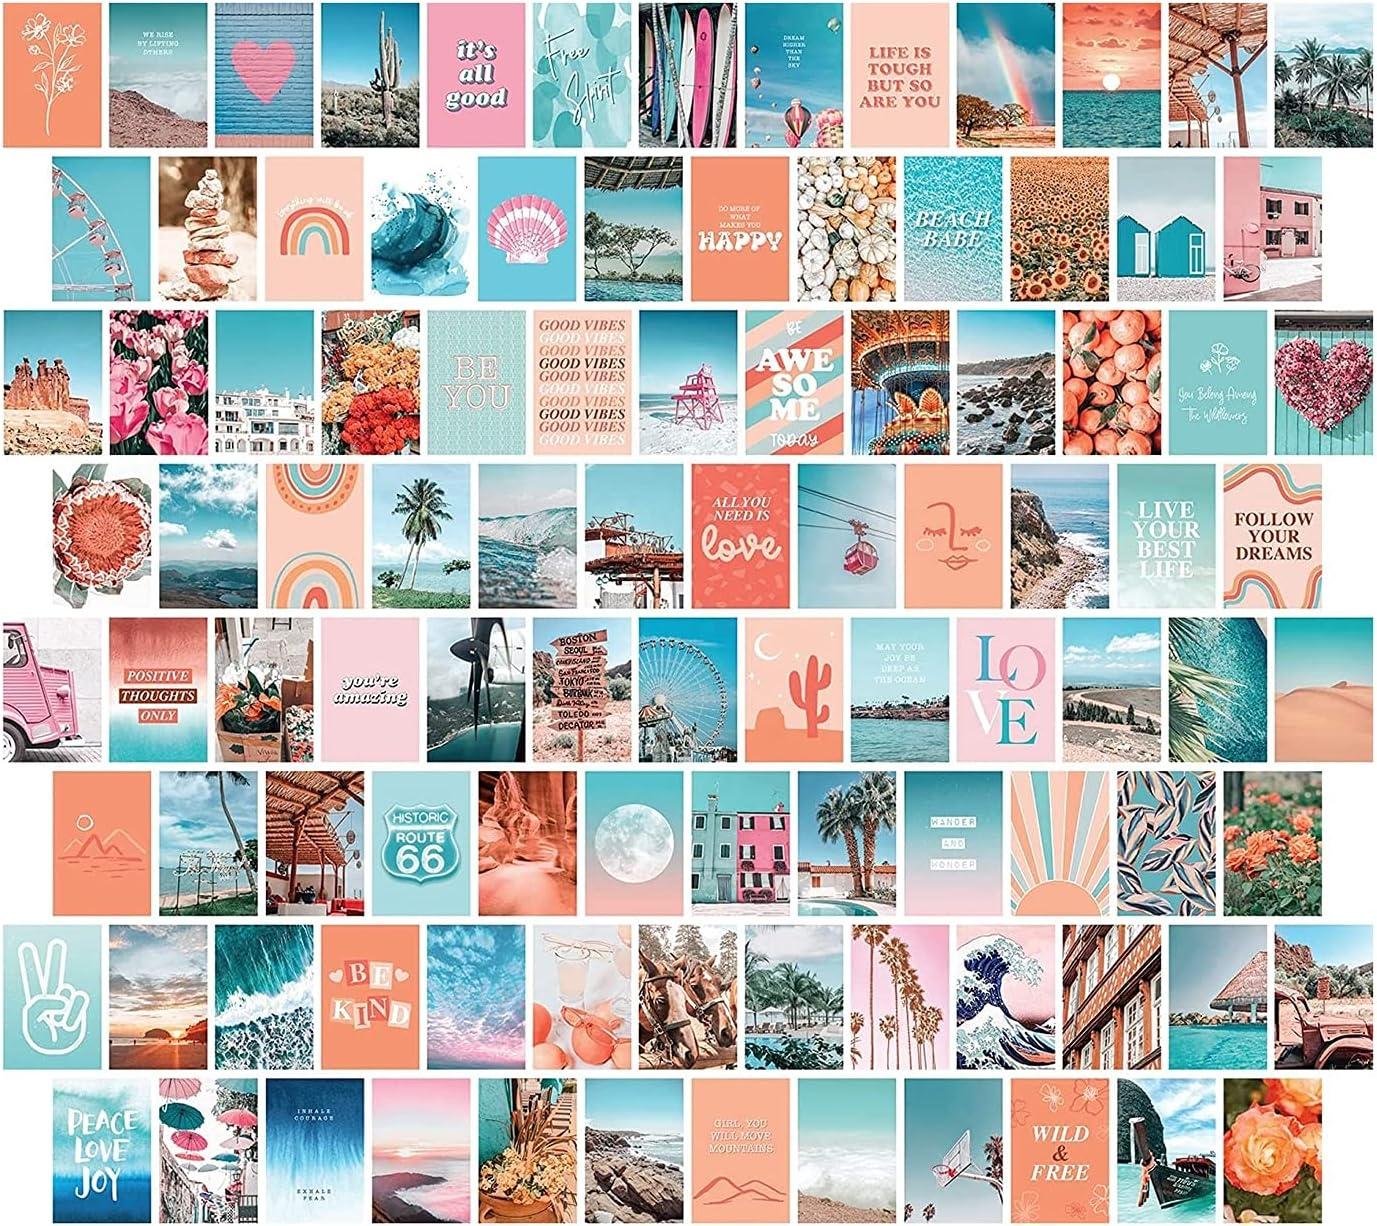 Funiee 100 PCS Wall Collage Kit Pictures Estética, 100 Set Decoración De La Habitación Estética, 4X6 Pulgadas De Estilo Boho Decoración De La Habitación para Niñas, VSCO Posters para Dormitorio